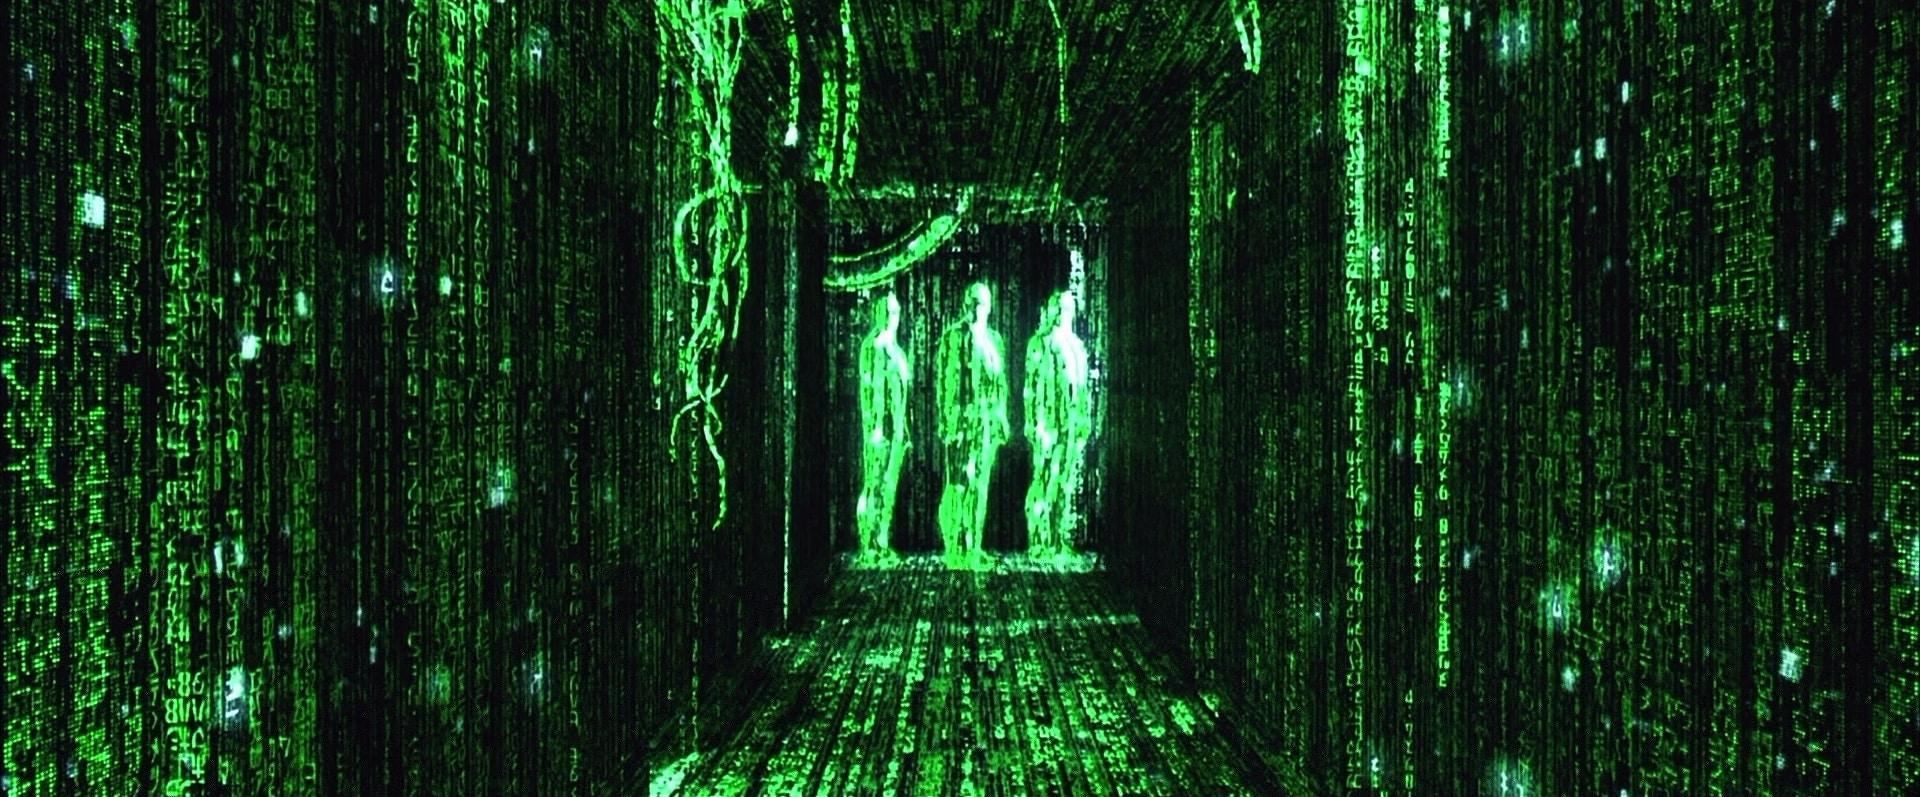 Cómo salir de Matrix según Philp K. Dick 15